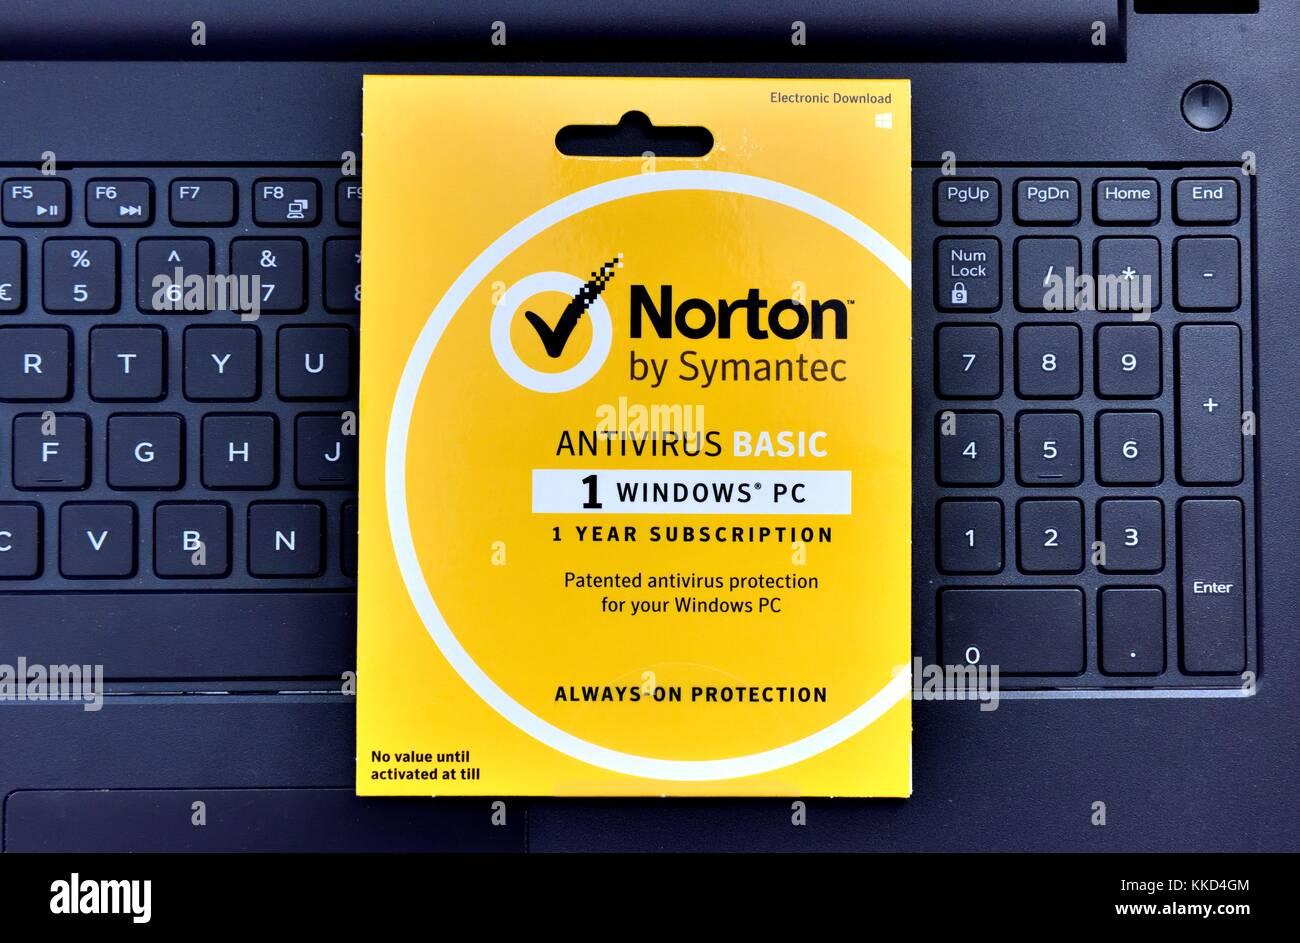 Norton Antivirus Basic download Pack Stockfoto